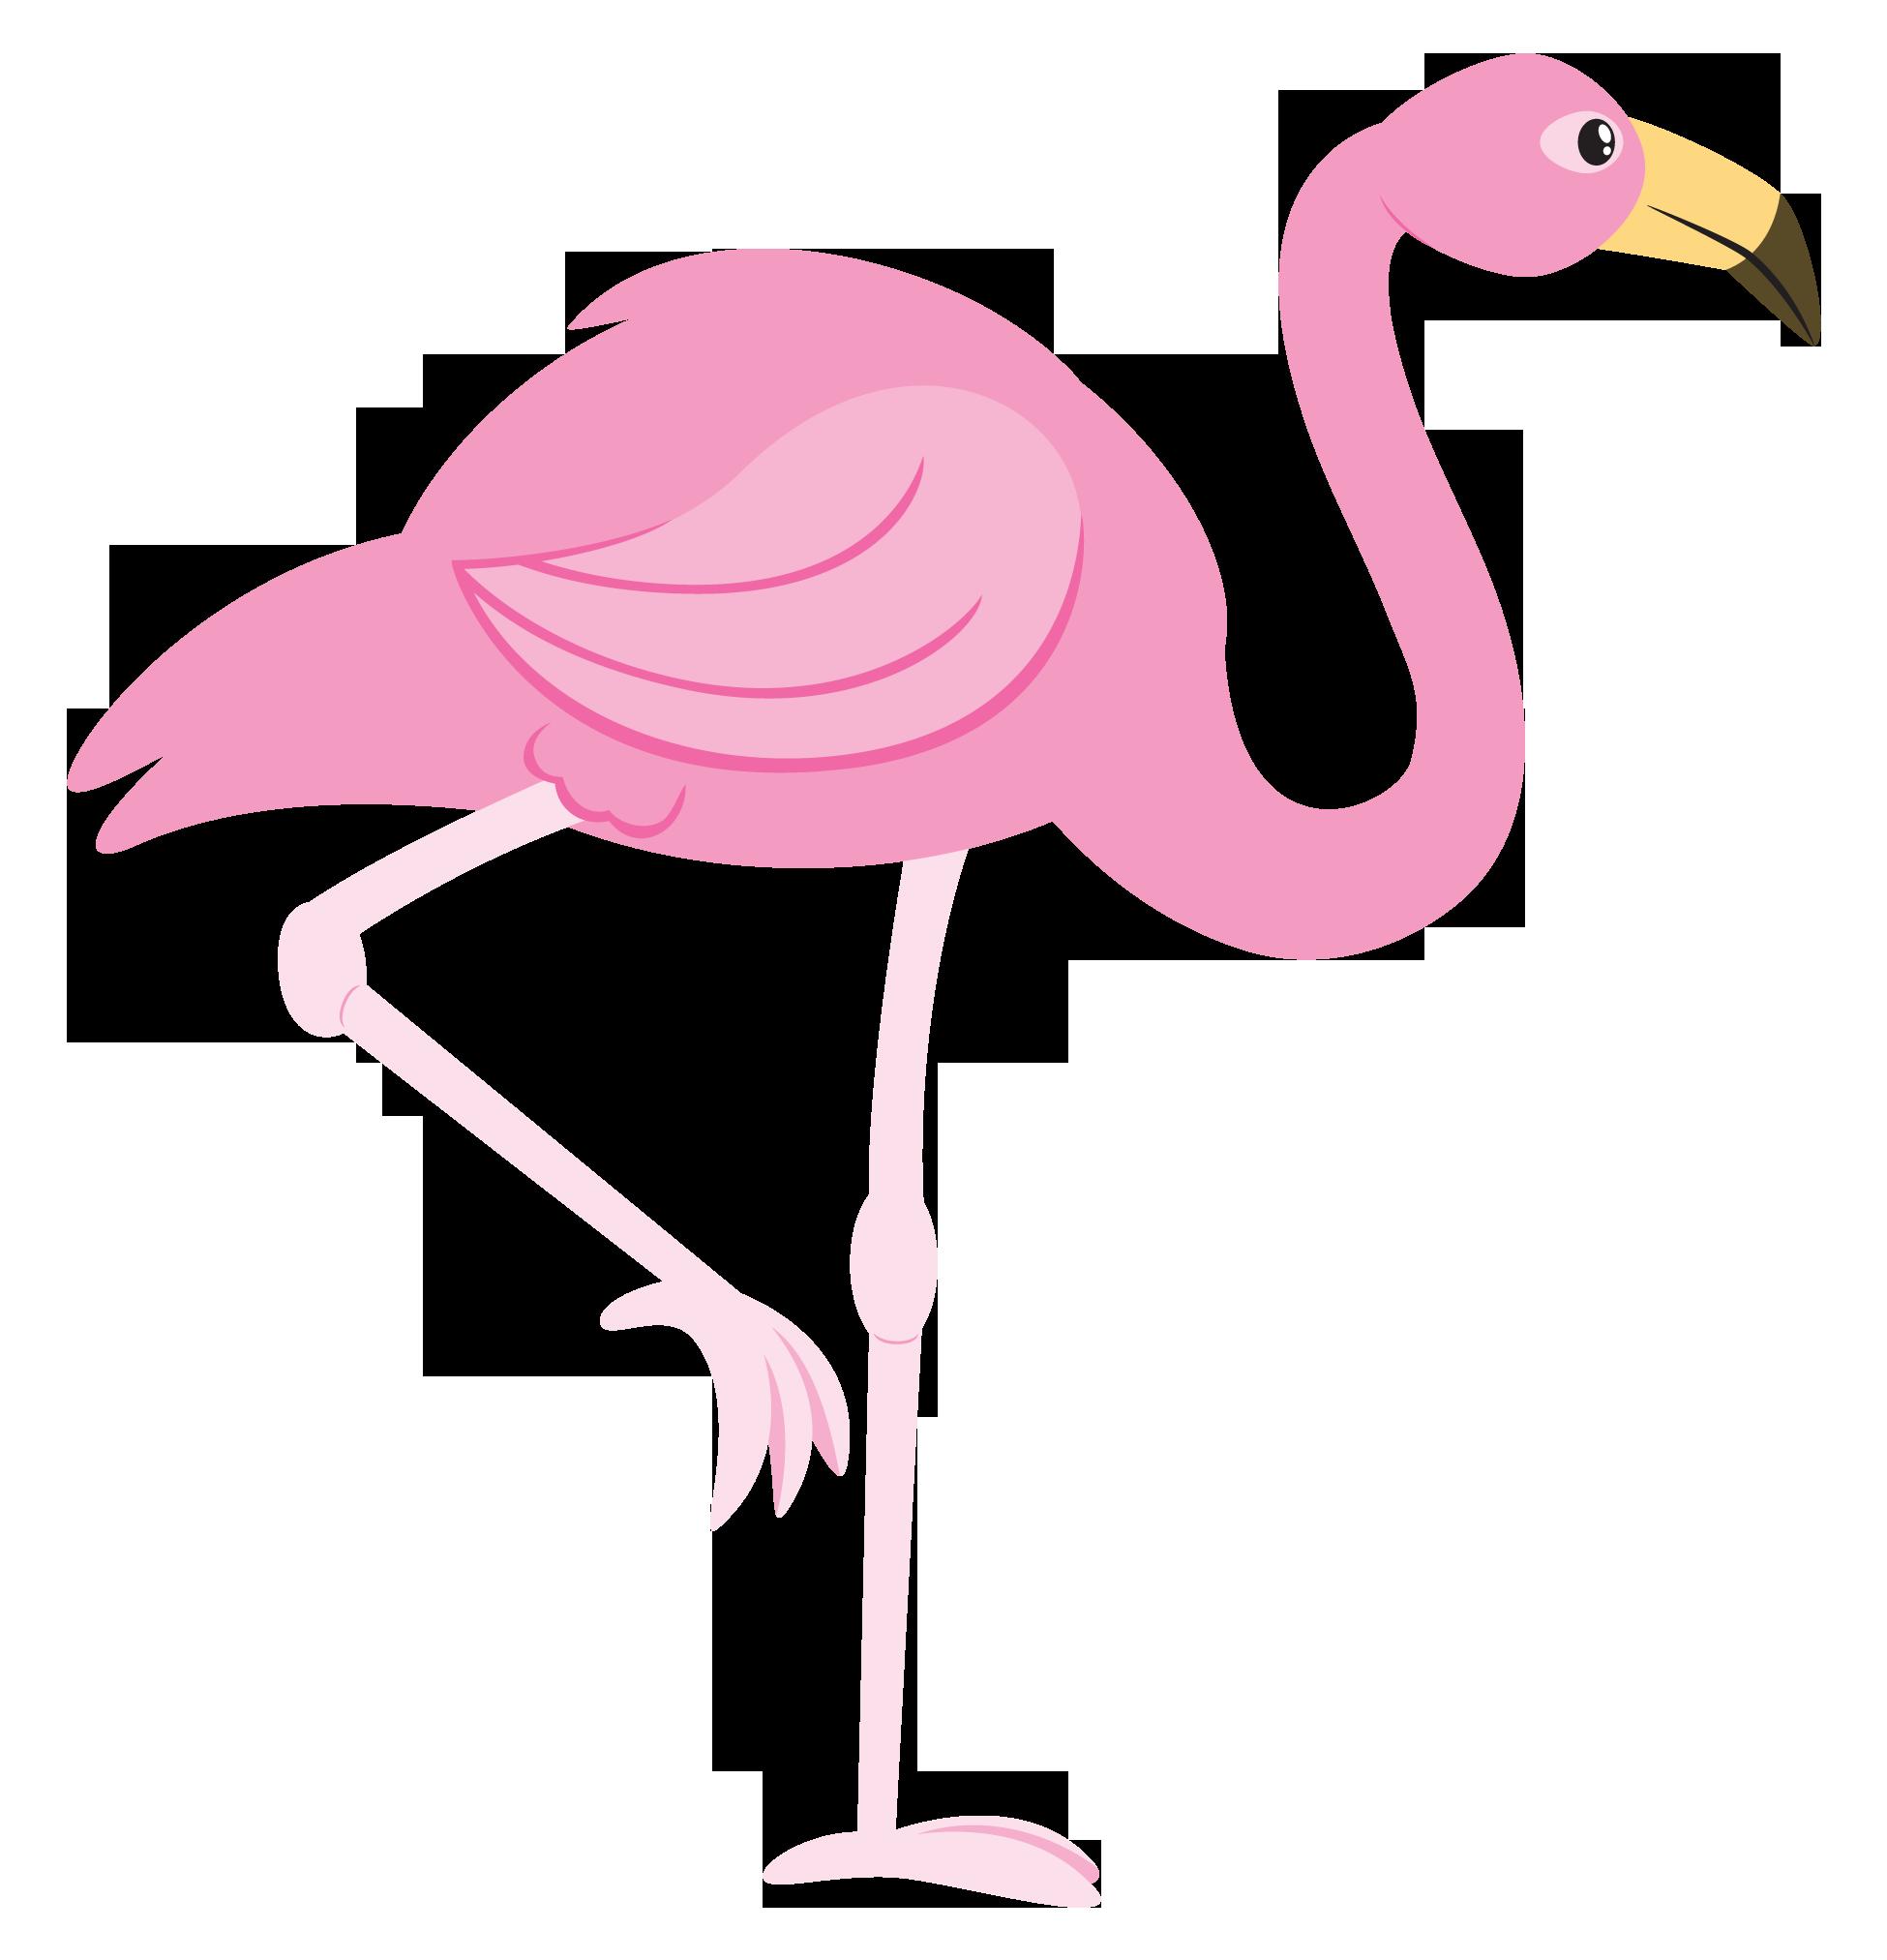 Flamingo Cartoon Images - Cliparts.co